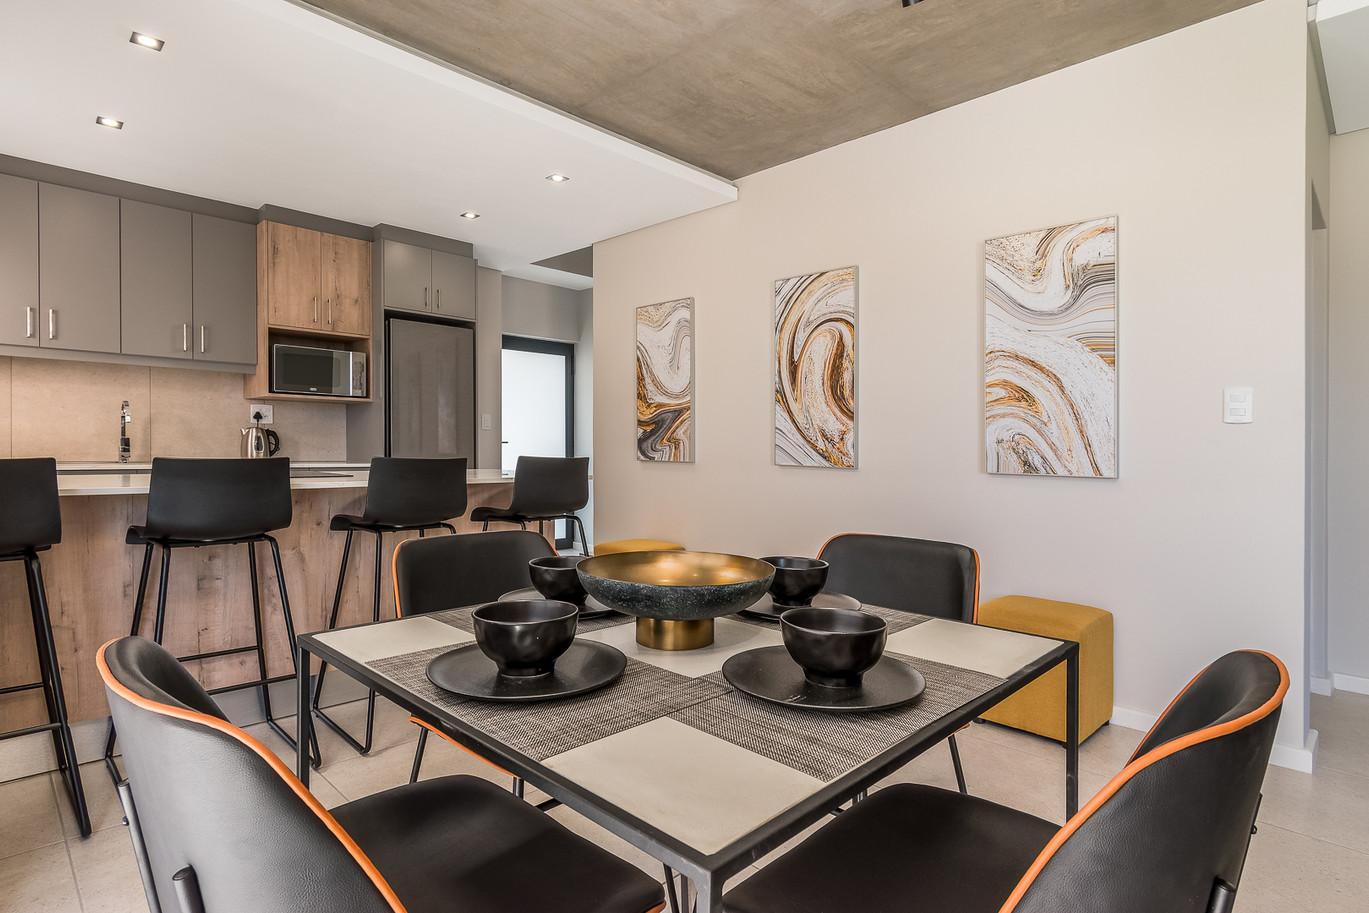 Greystone-Dining Room